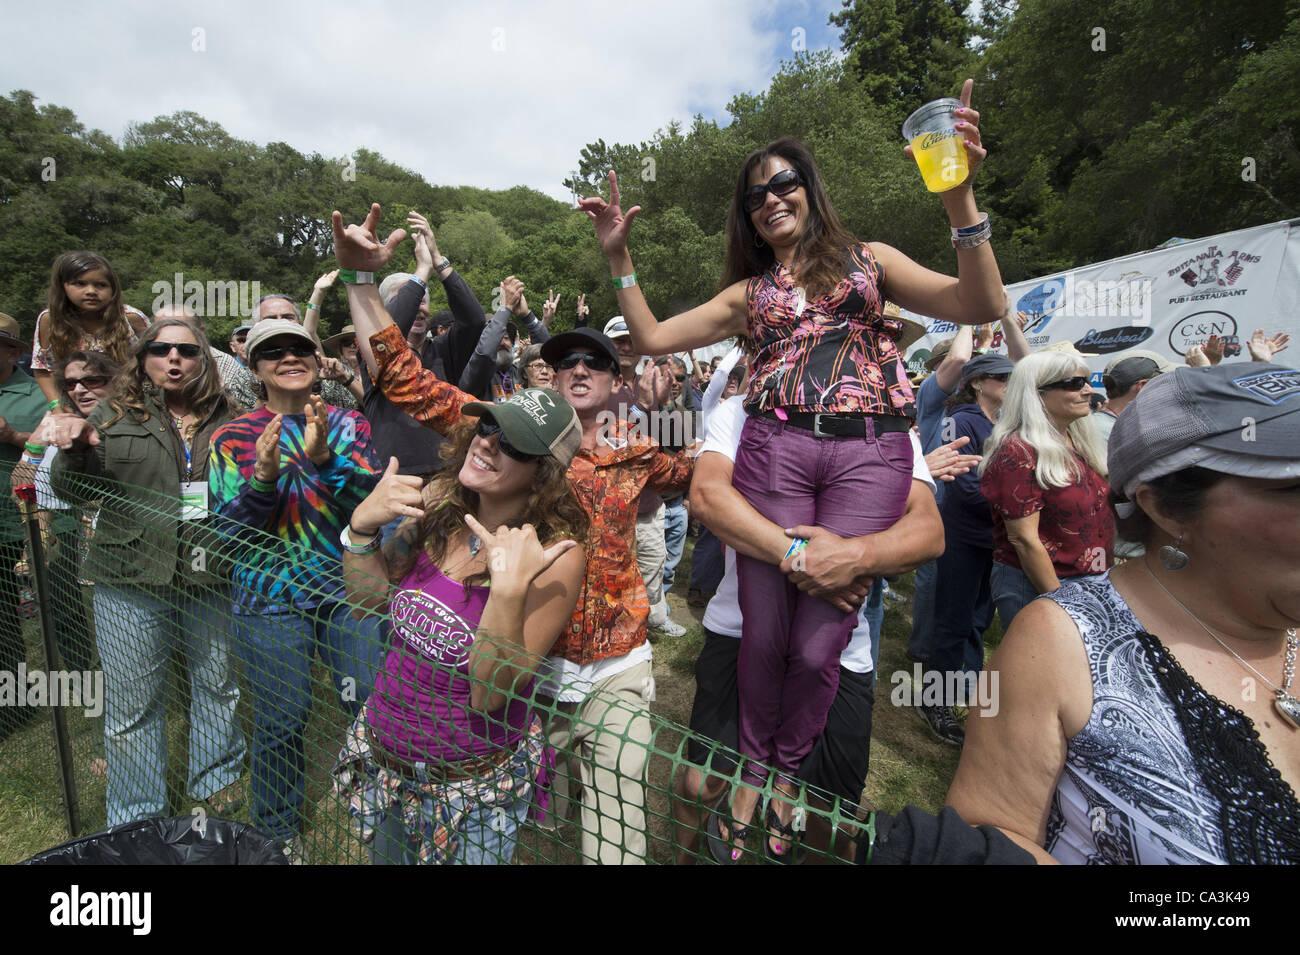 May 26, 2012 - Aptos, CA, USA - Fans at the 20th annual Santa Cruz Blues Festival. (Credit Image: © Jerome - Stock Image